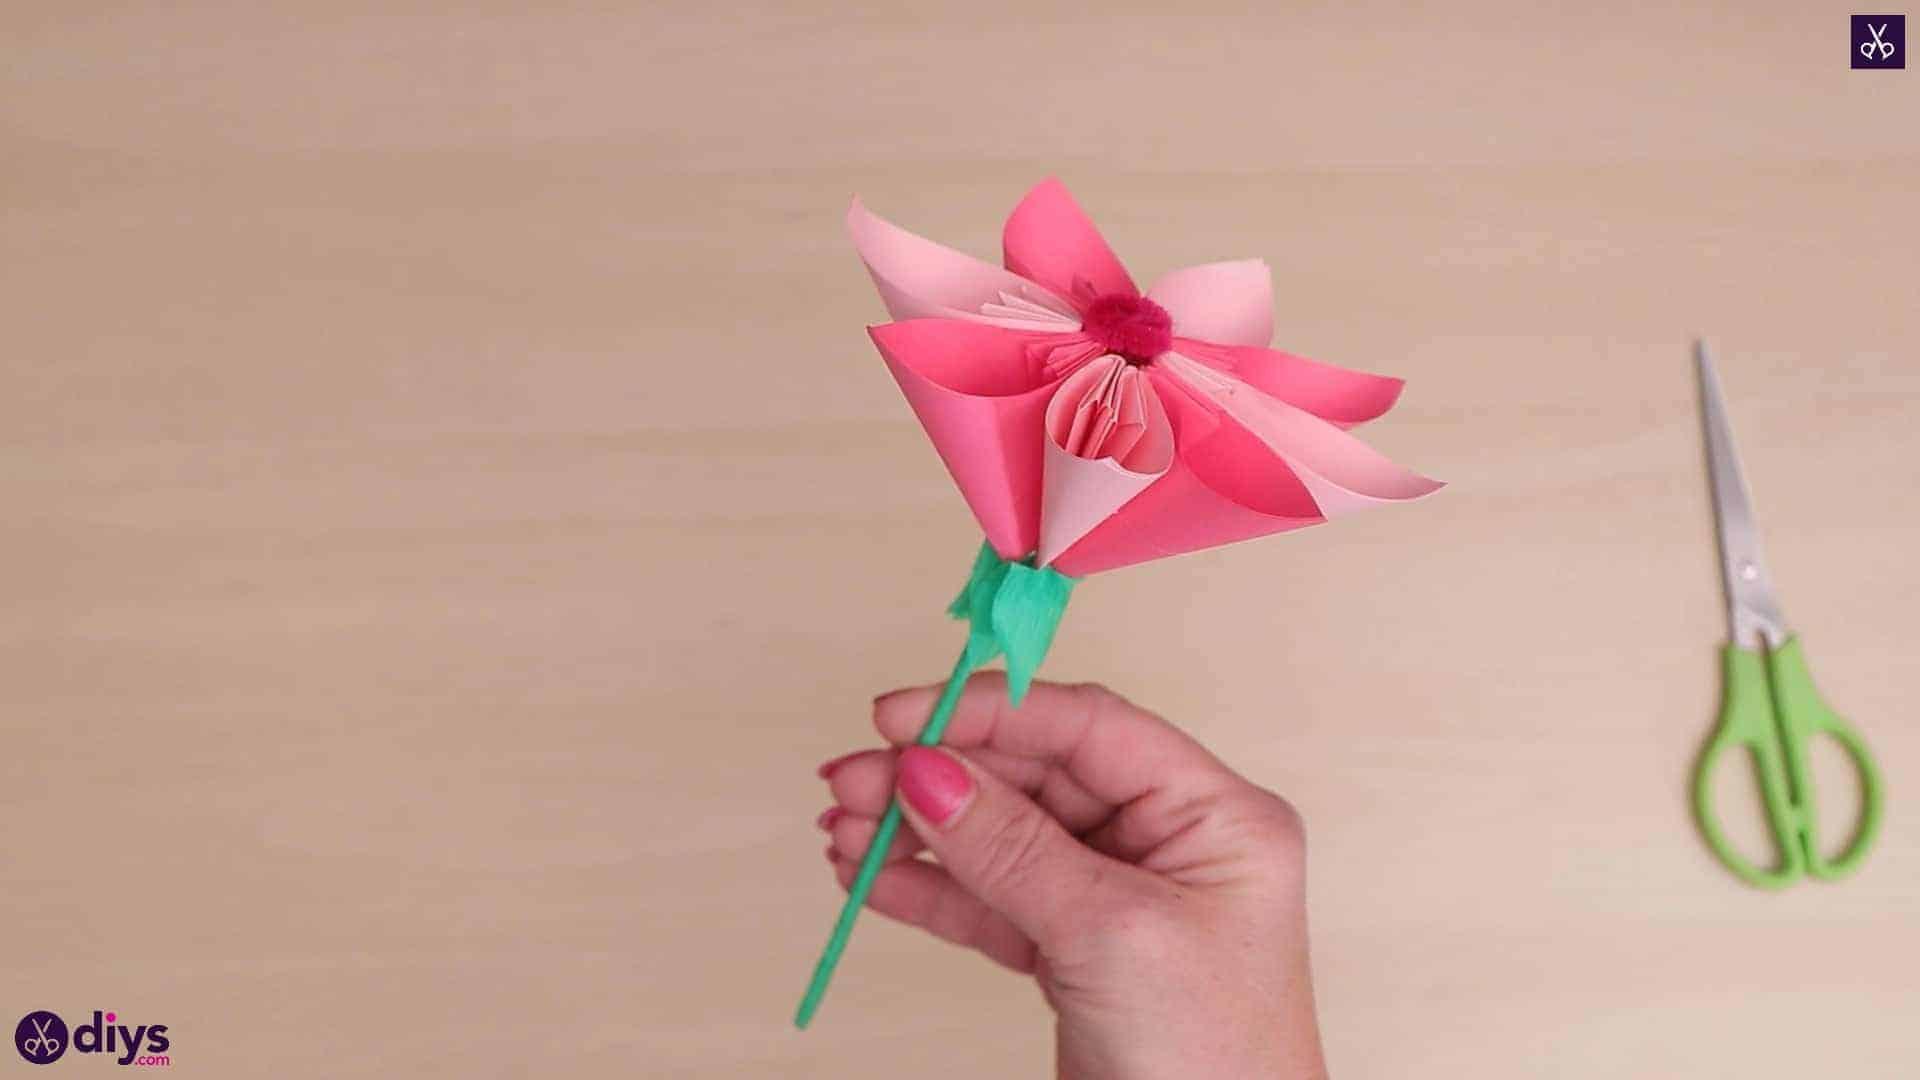 Diy 3d paper flower